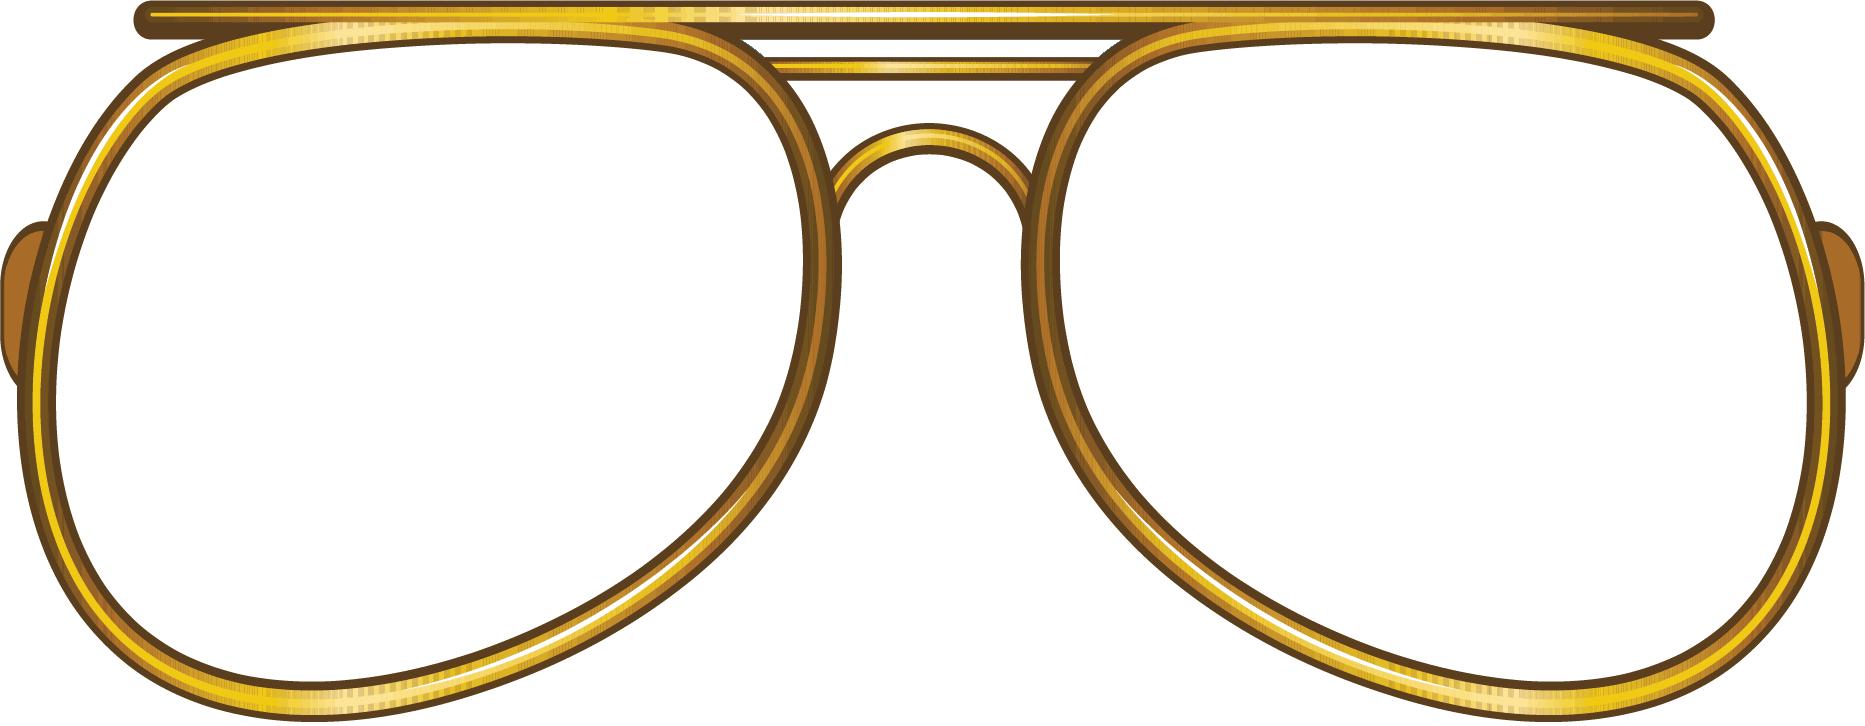 Sunglasses clip art free clipart images